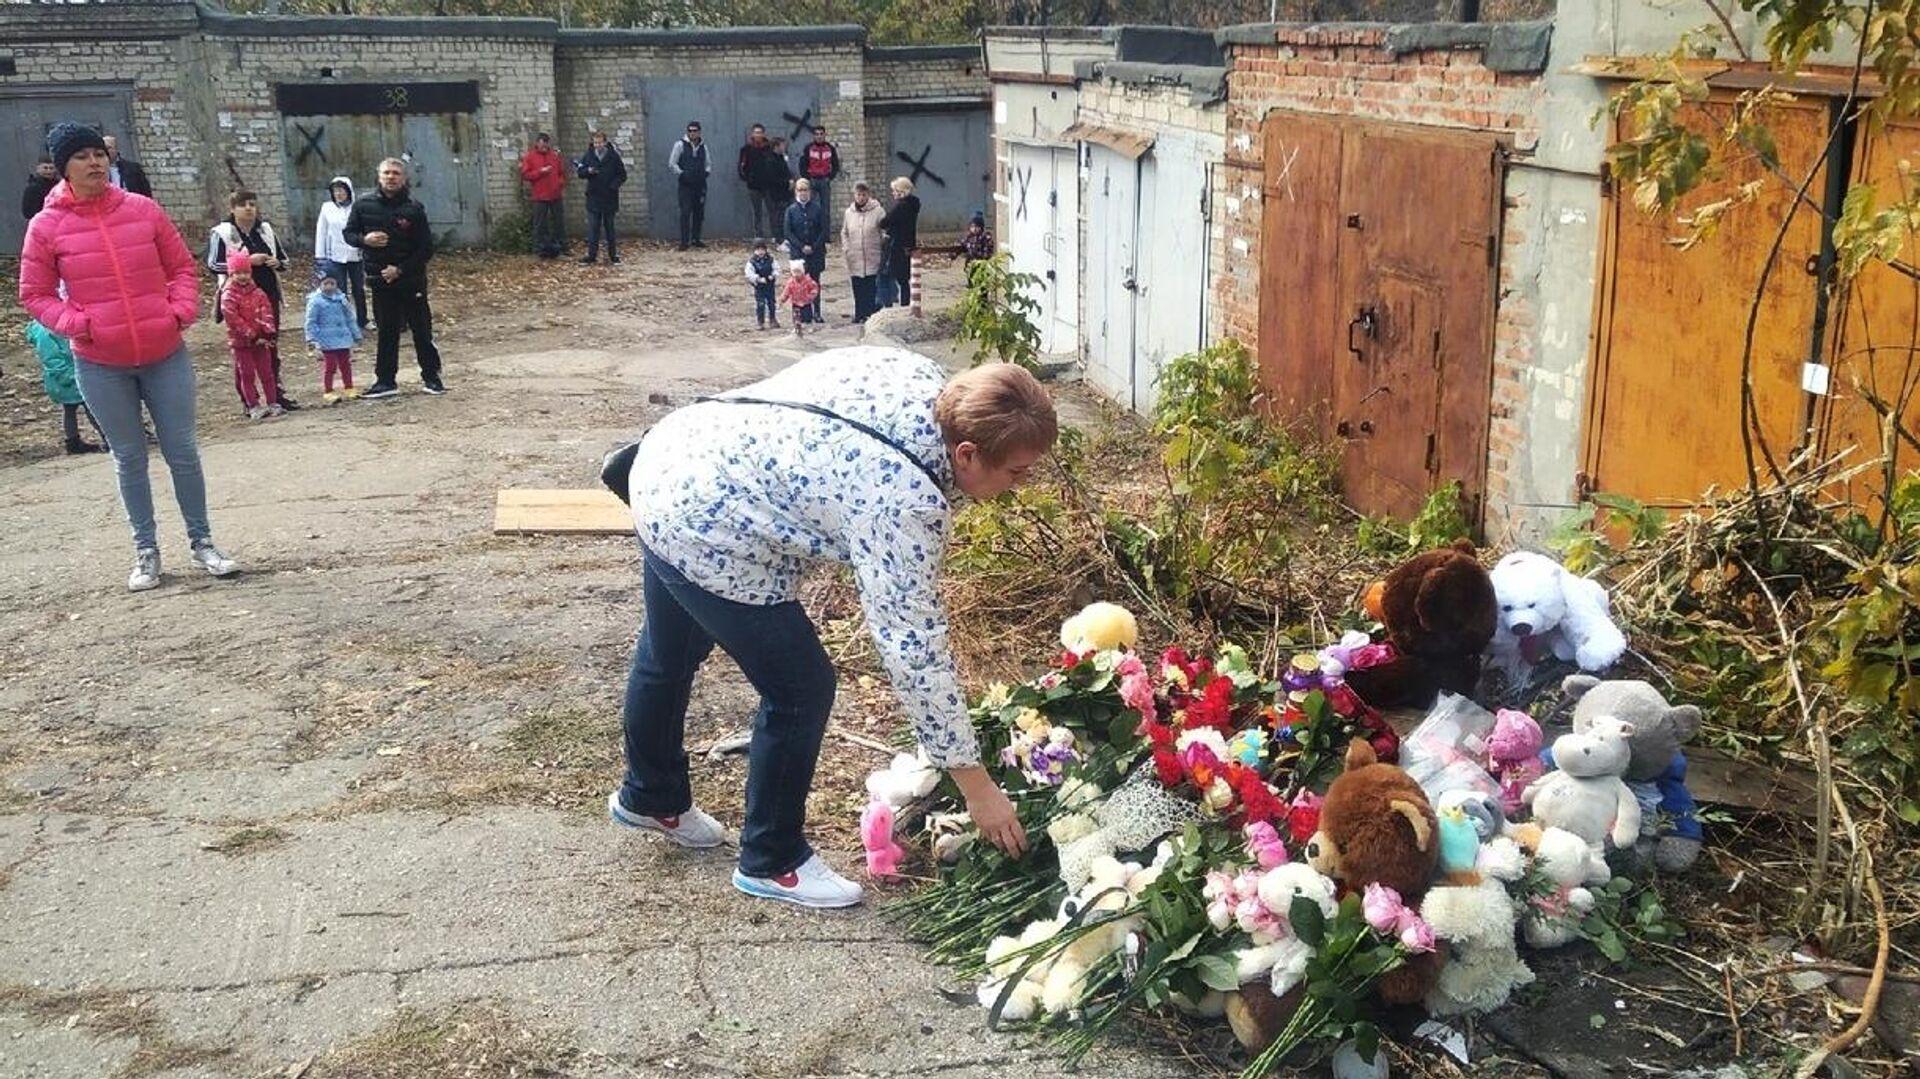 Убийство девятилетней девочки в Саратове - РИА Новости, 1920, 11.10.2019